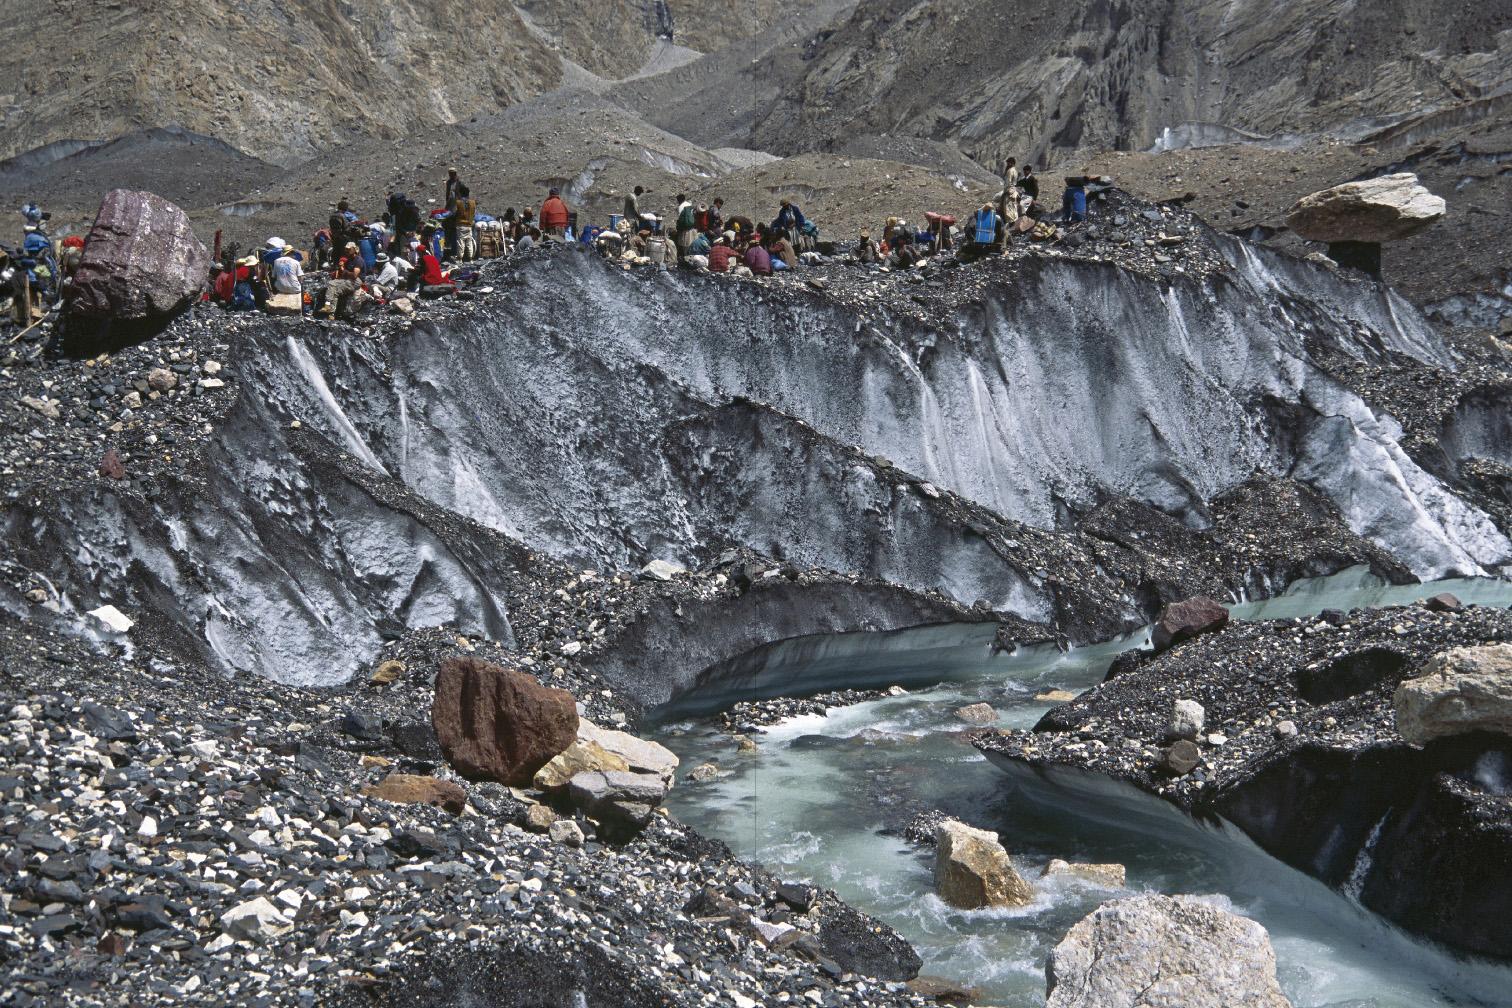 K2 EXPEDITION 1954-2004 Giuseppe Ghedina Fotografo - 107.jpg